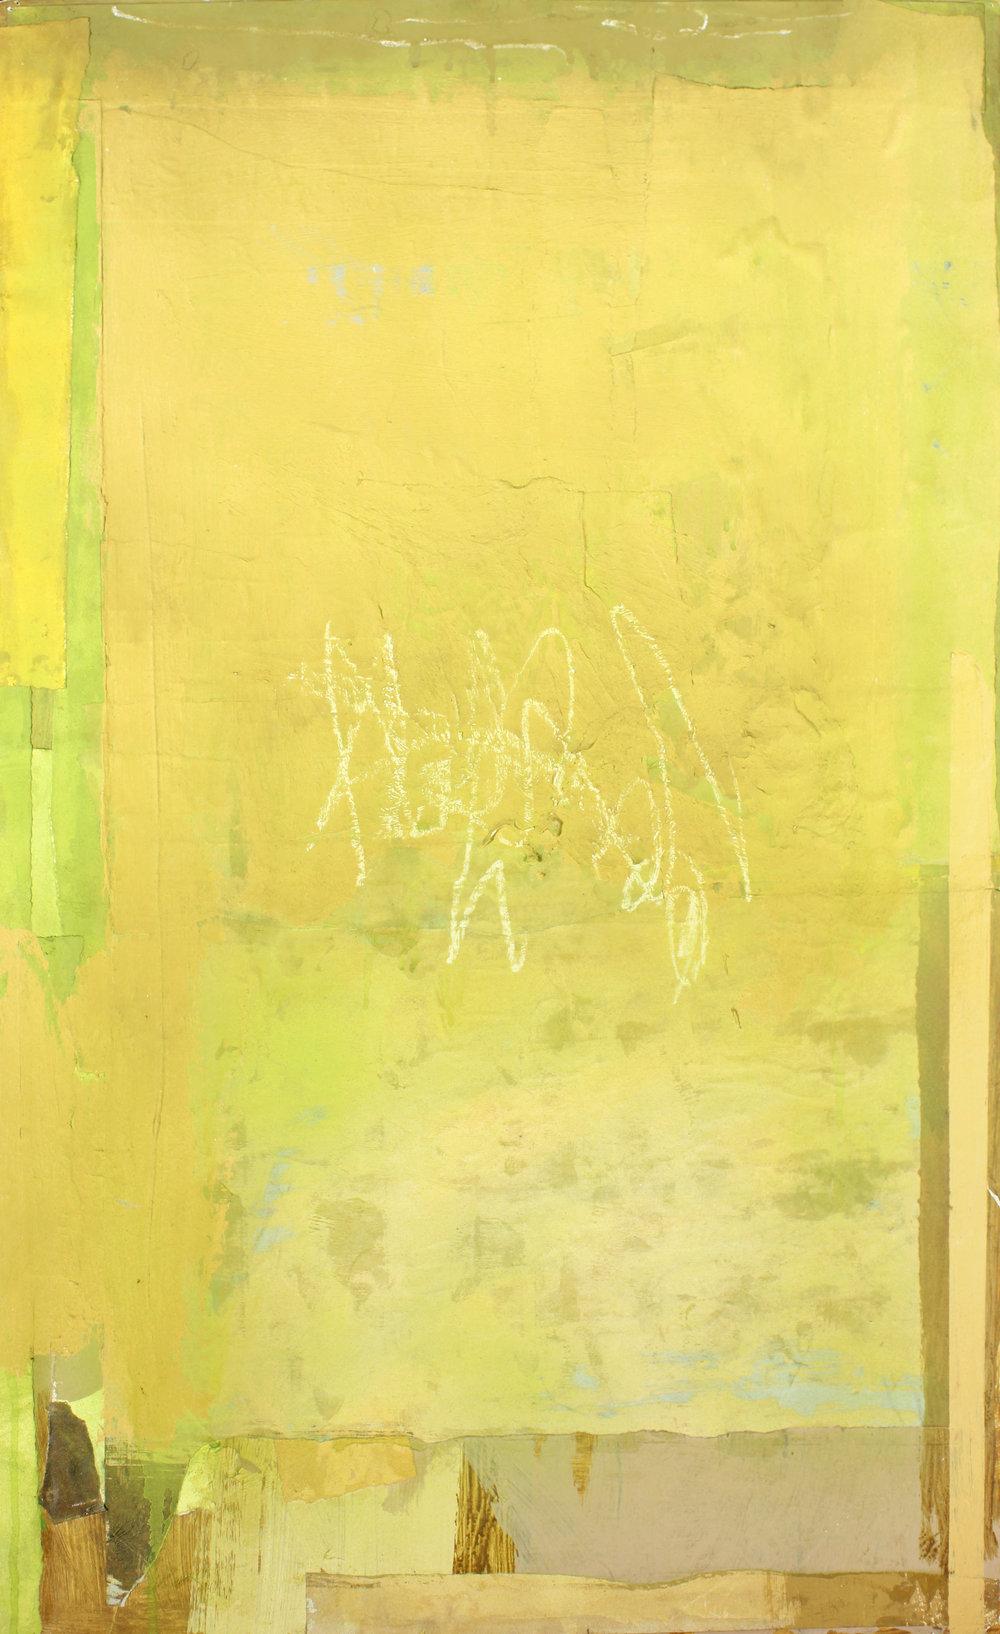 1976_SealsofTimeC_gouachepastelandcollageonpaper_37x23_WPNF043.jpg